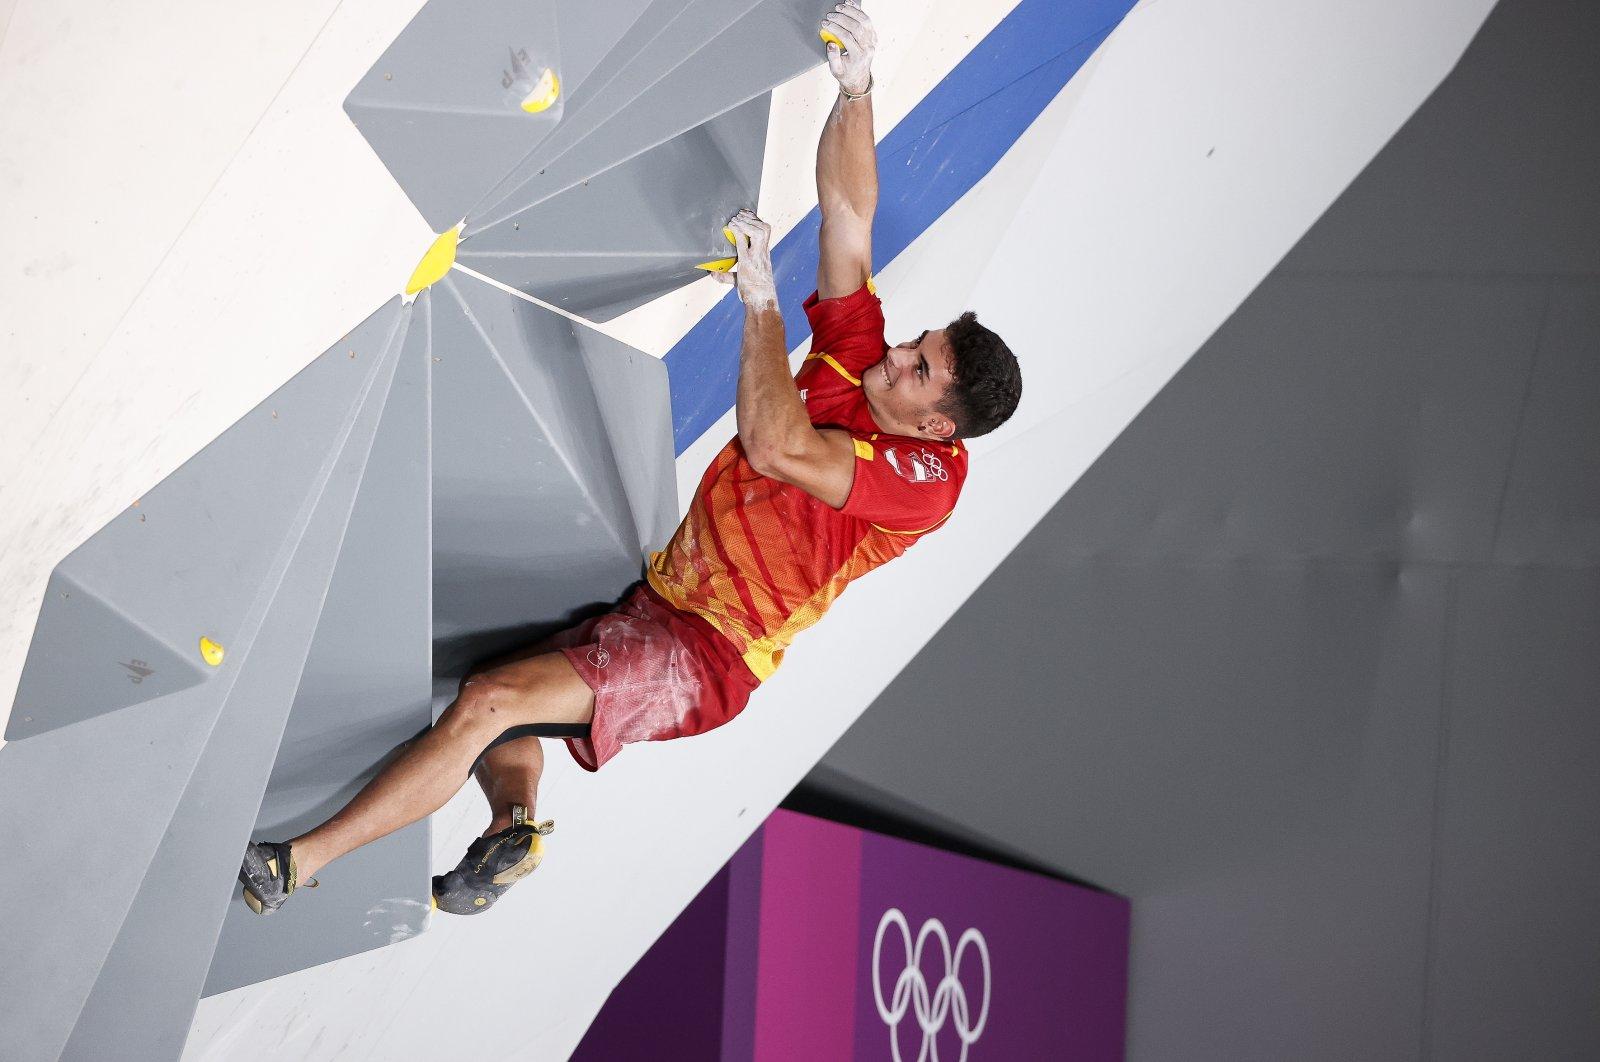 Spain's Alberto Gines Lopez during the Tokyo 2020 Olympics men's sport climbing final at the Aomi Urban Sports Park, Tokyo, Japan, Aug. 5, 2021. (EPA Photo)